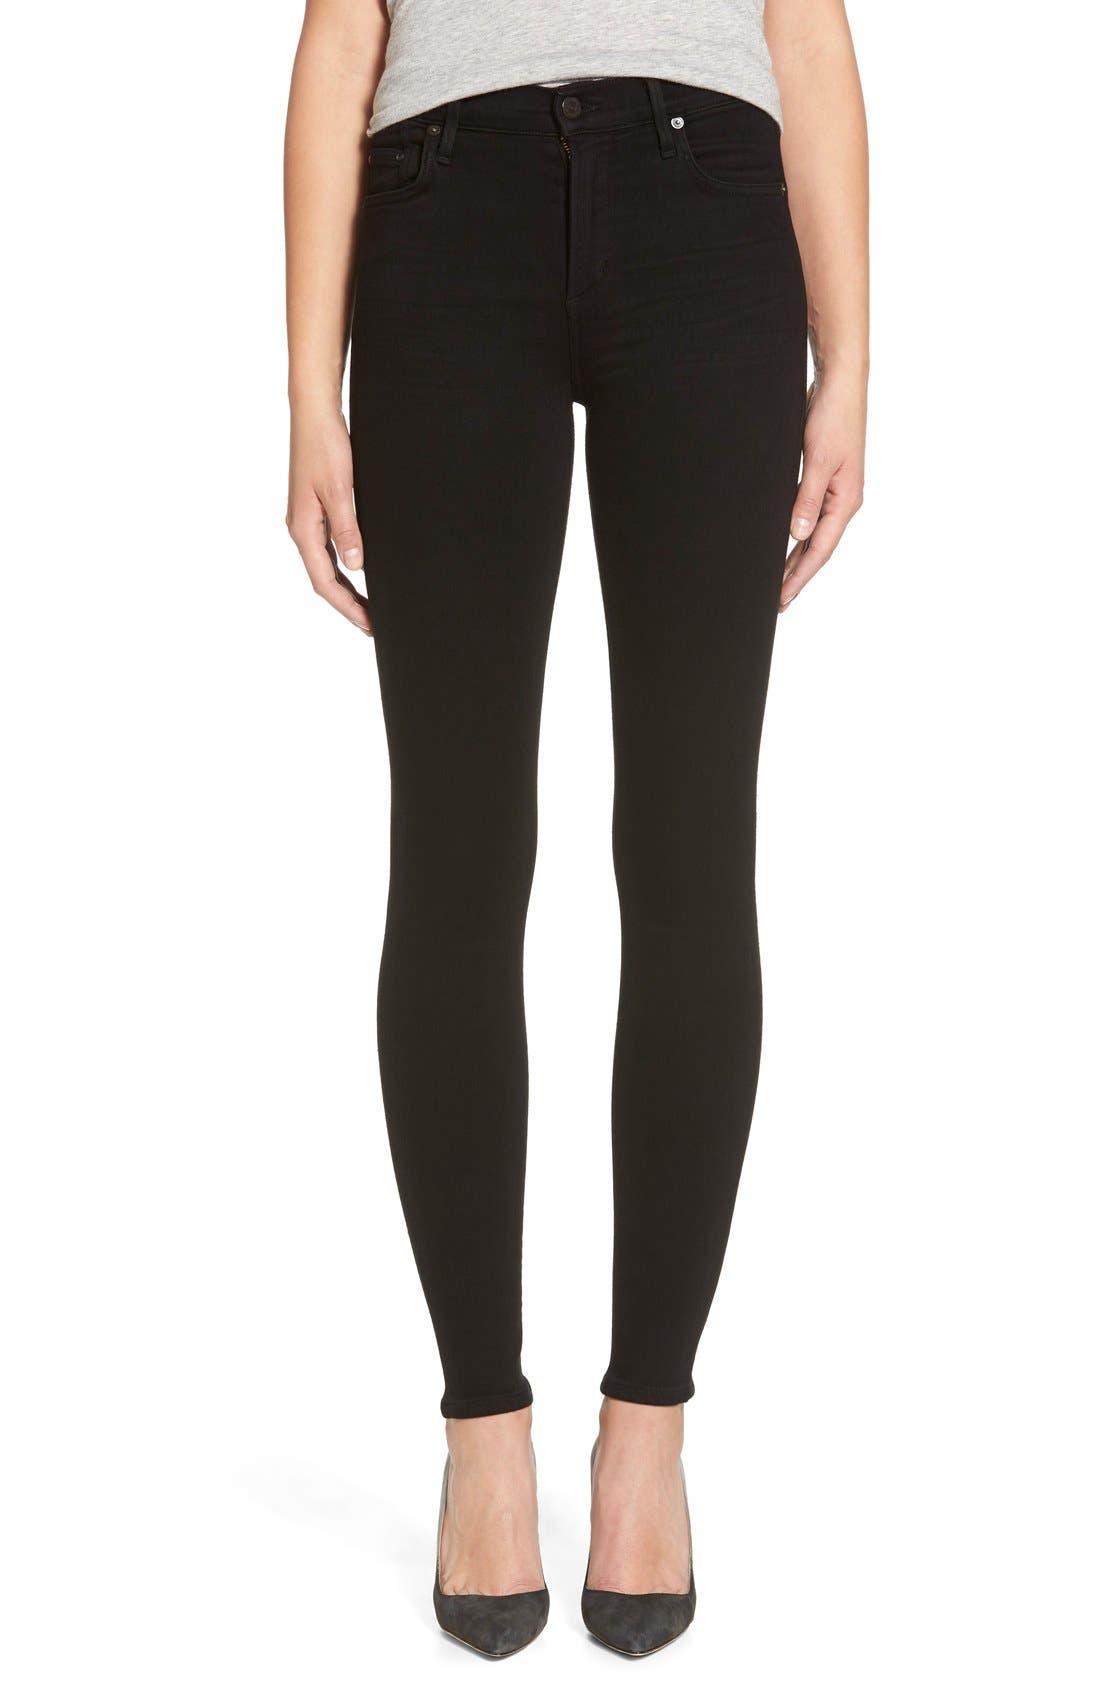 Rocket High Waist Skinny Jeans,                         Main,                         color, Black